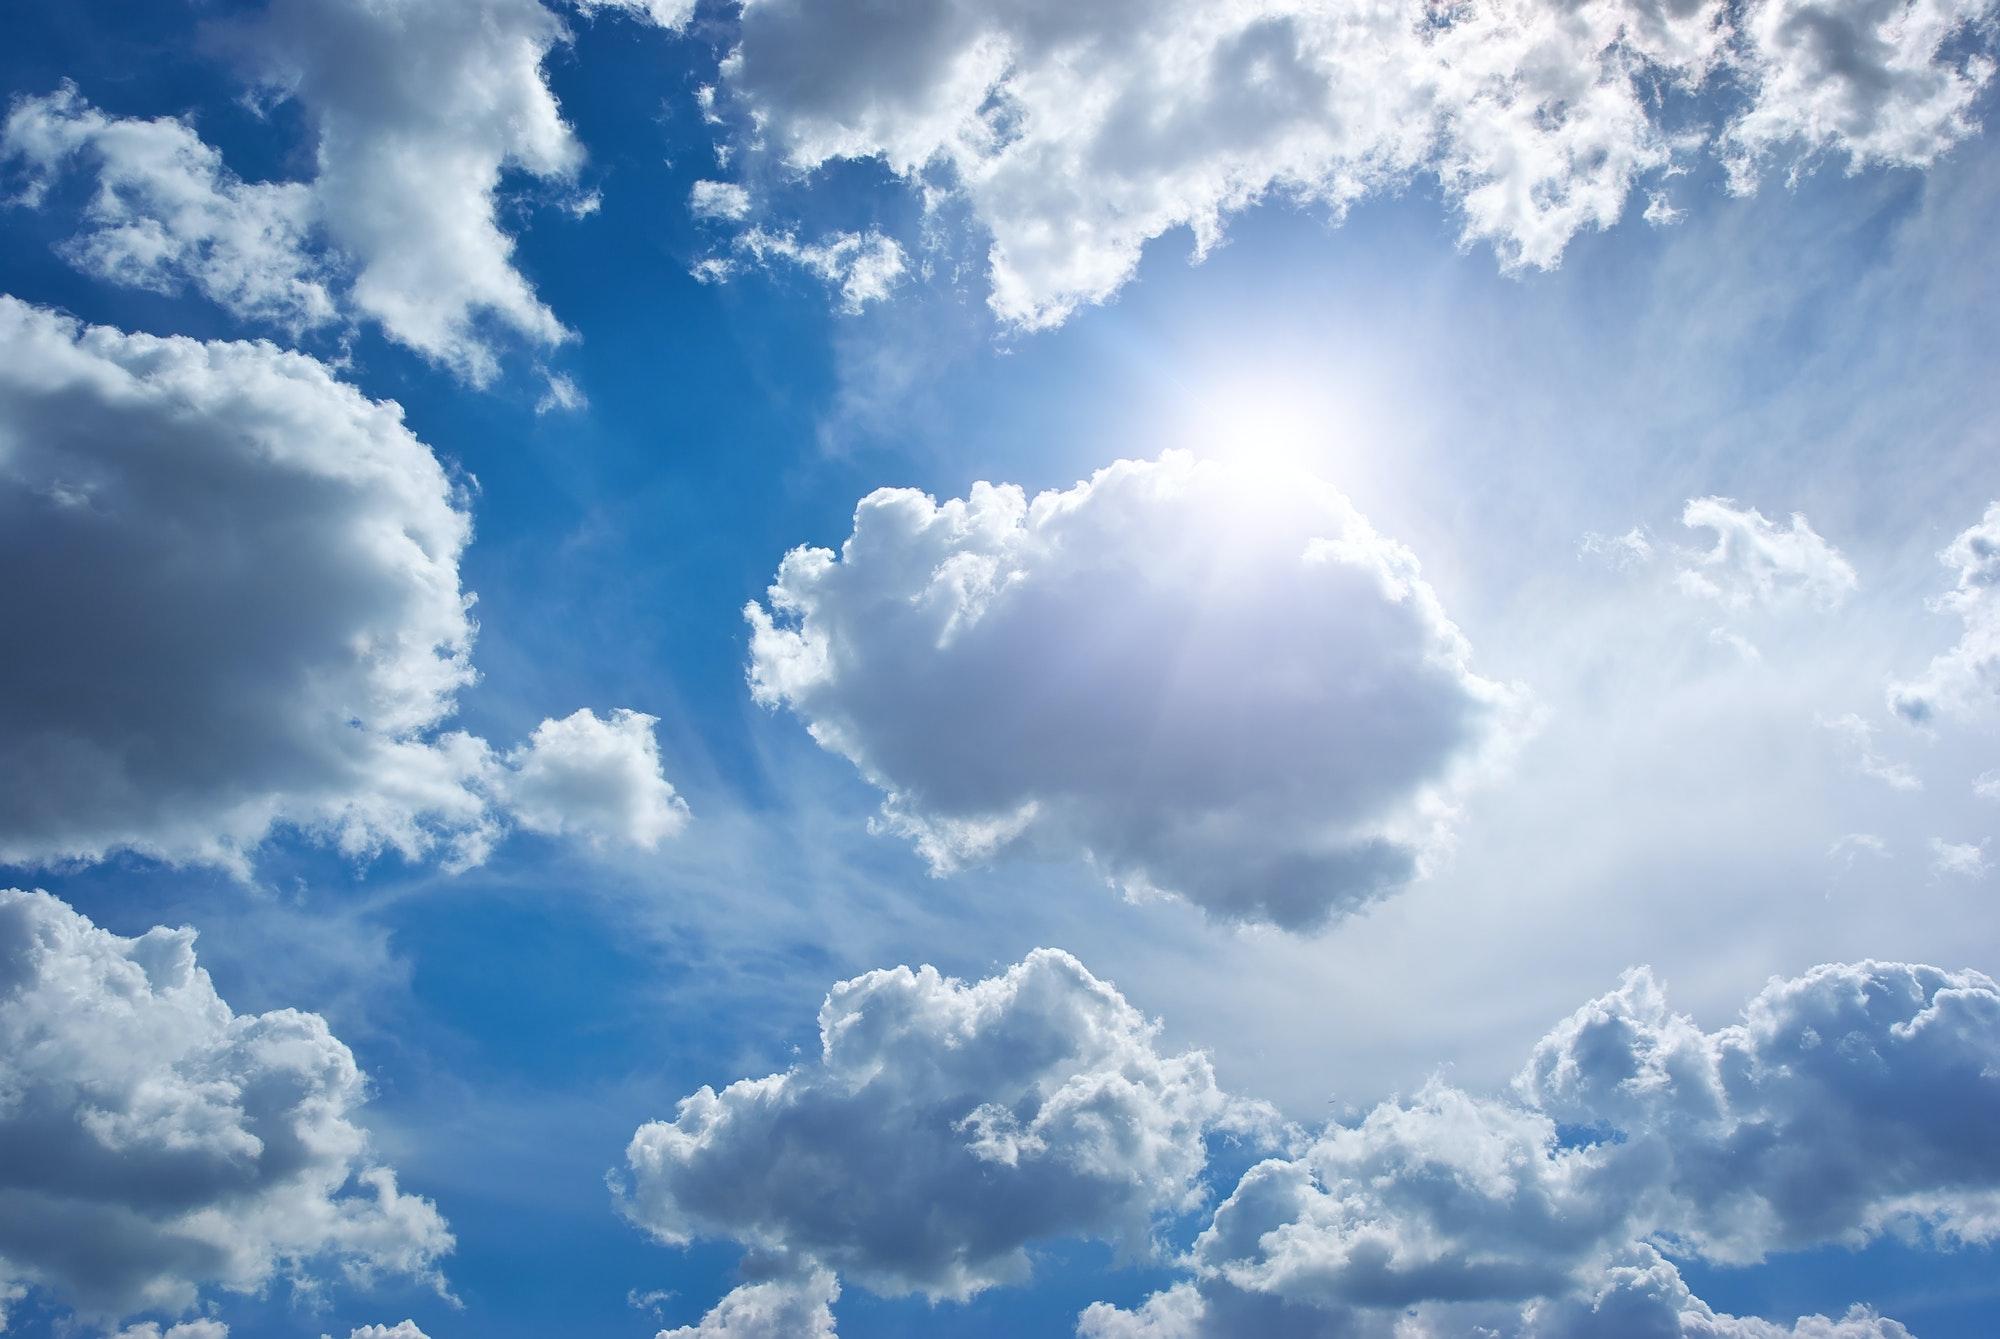 Blue skylight and fluffy cloud.